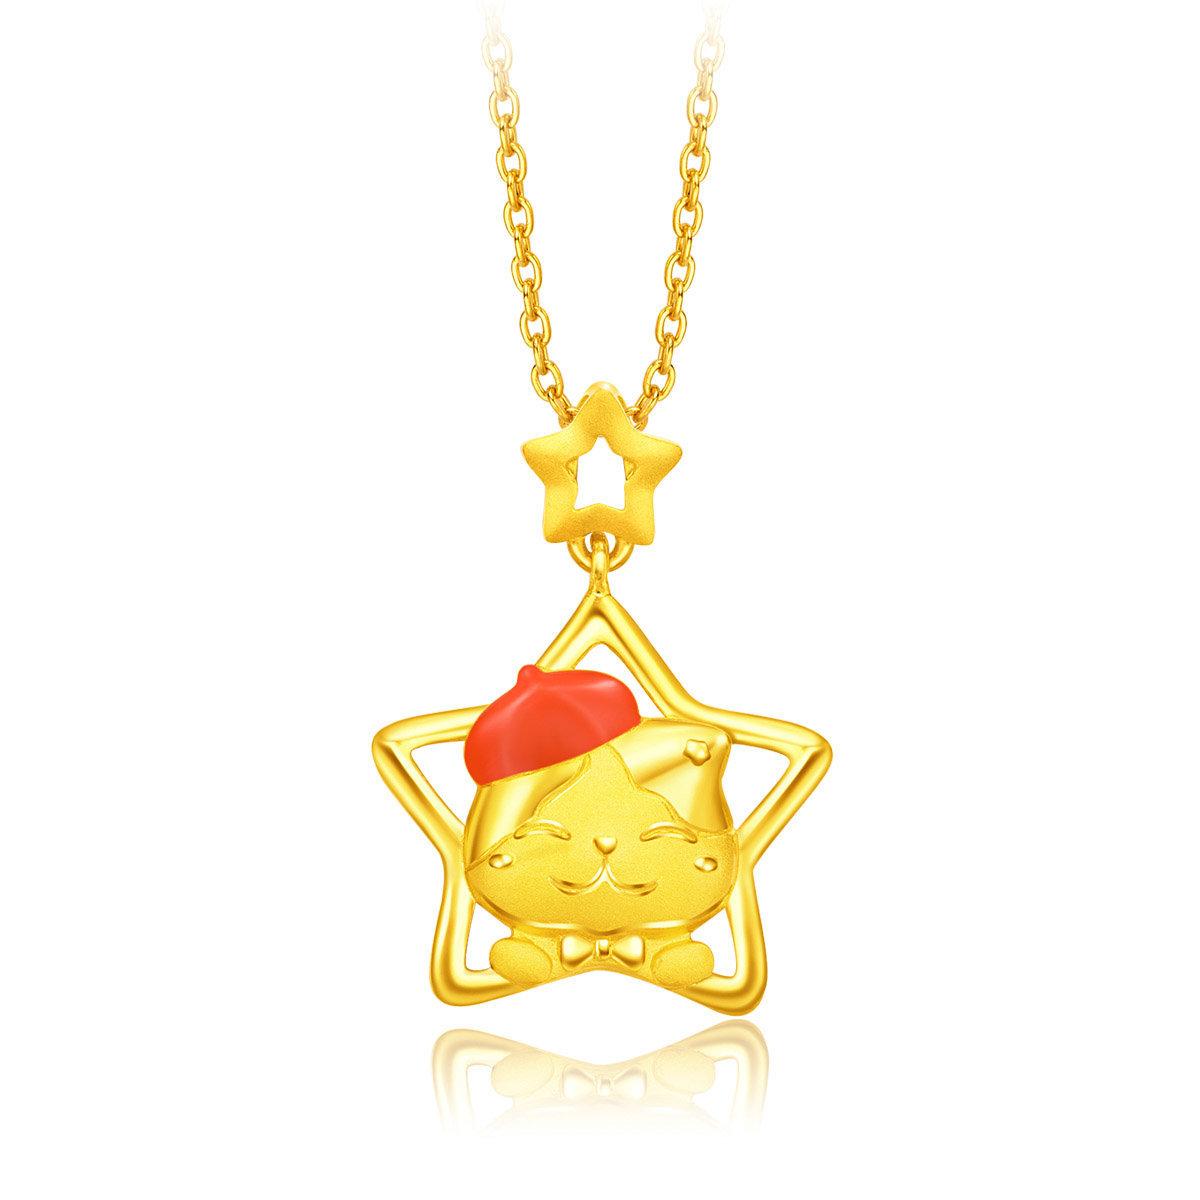 Ah Meow 999.9 Gold Pendant